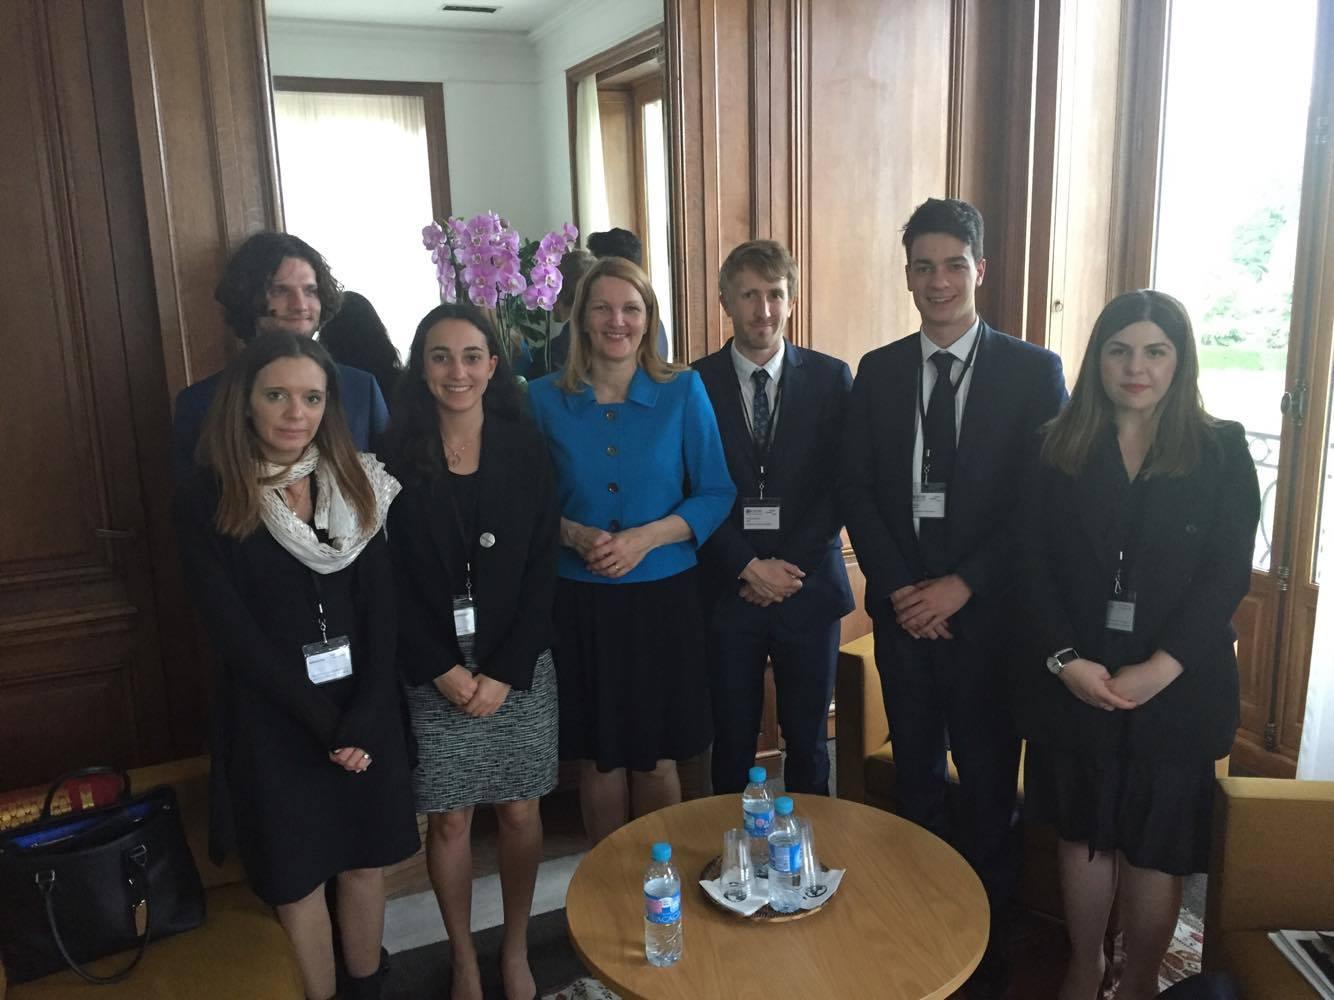 MEETING WITH MARI KIVINIEMI, DEPUTY SECRETARY-GENERAL OF THE OECD